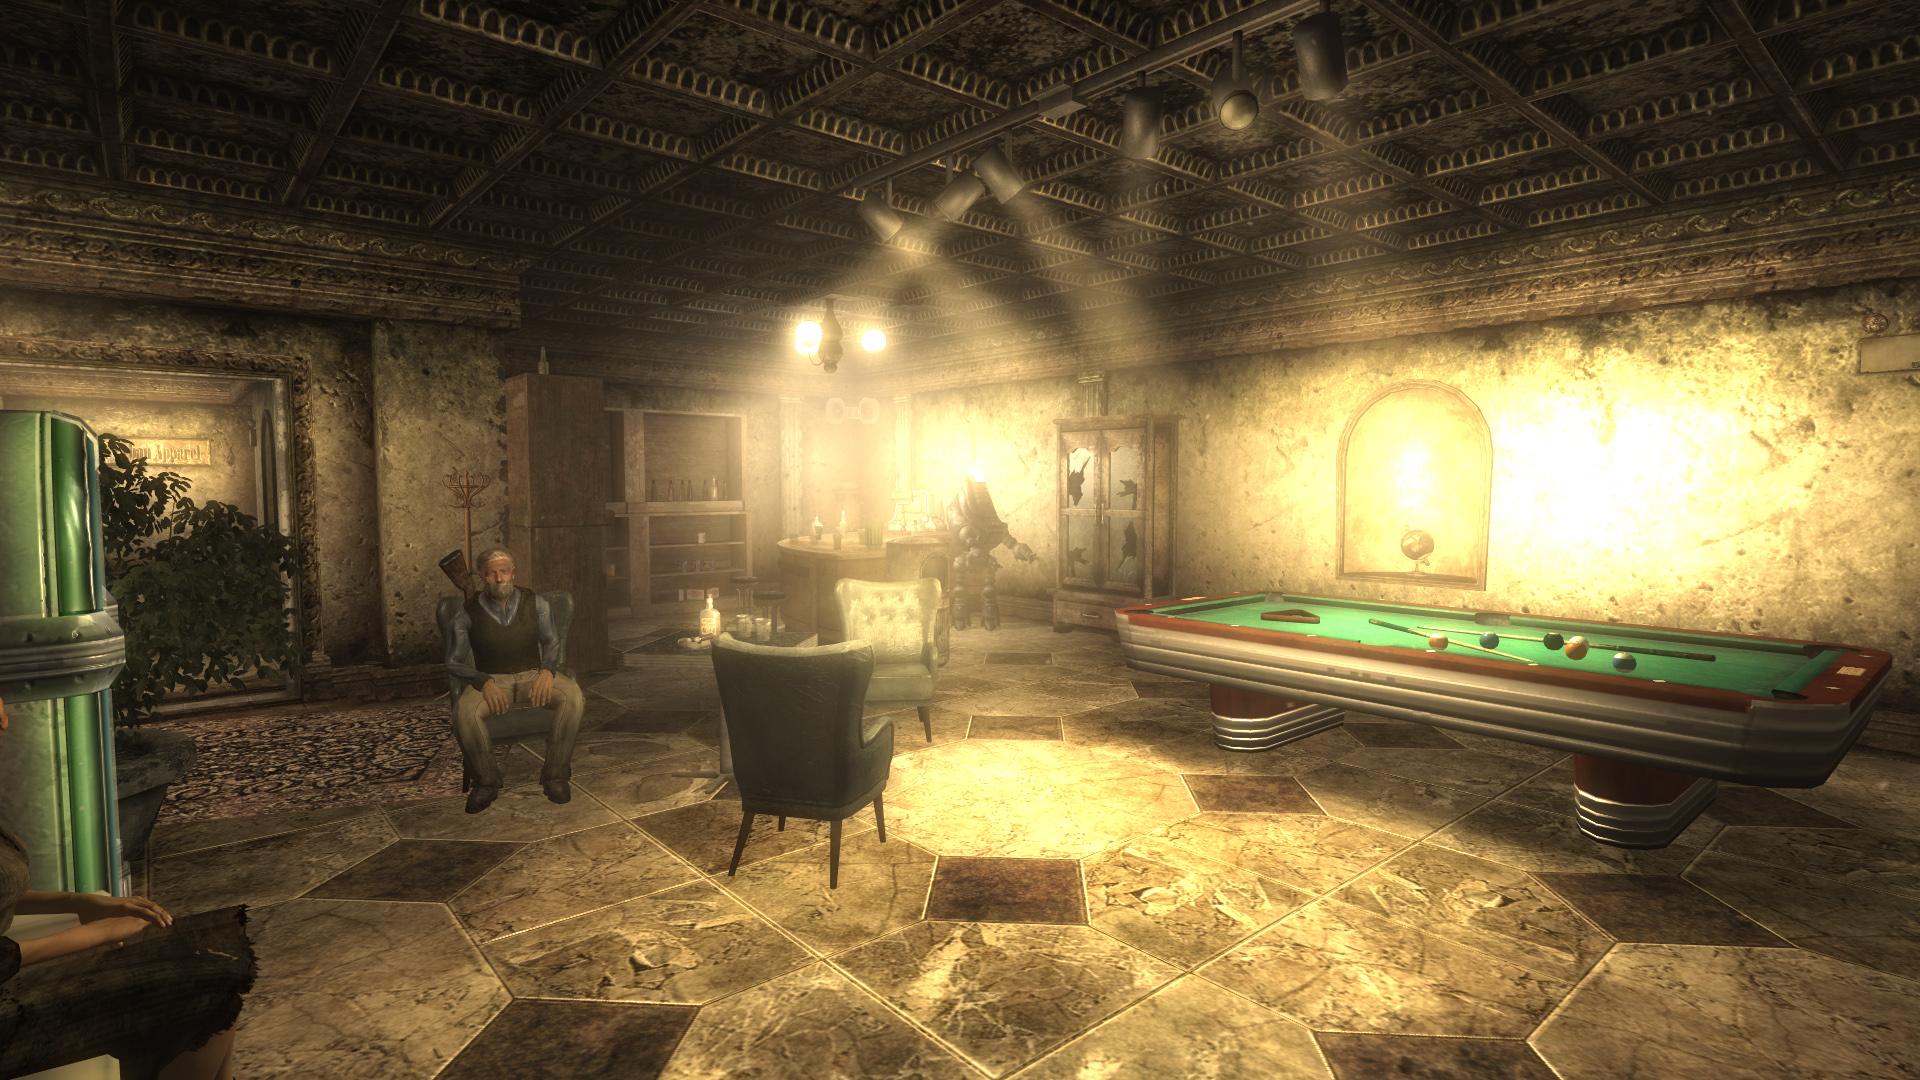 Federalist Lounge. The Federalist Lounge